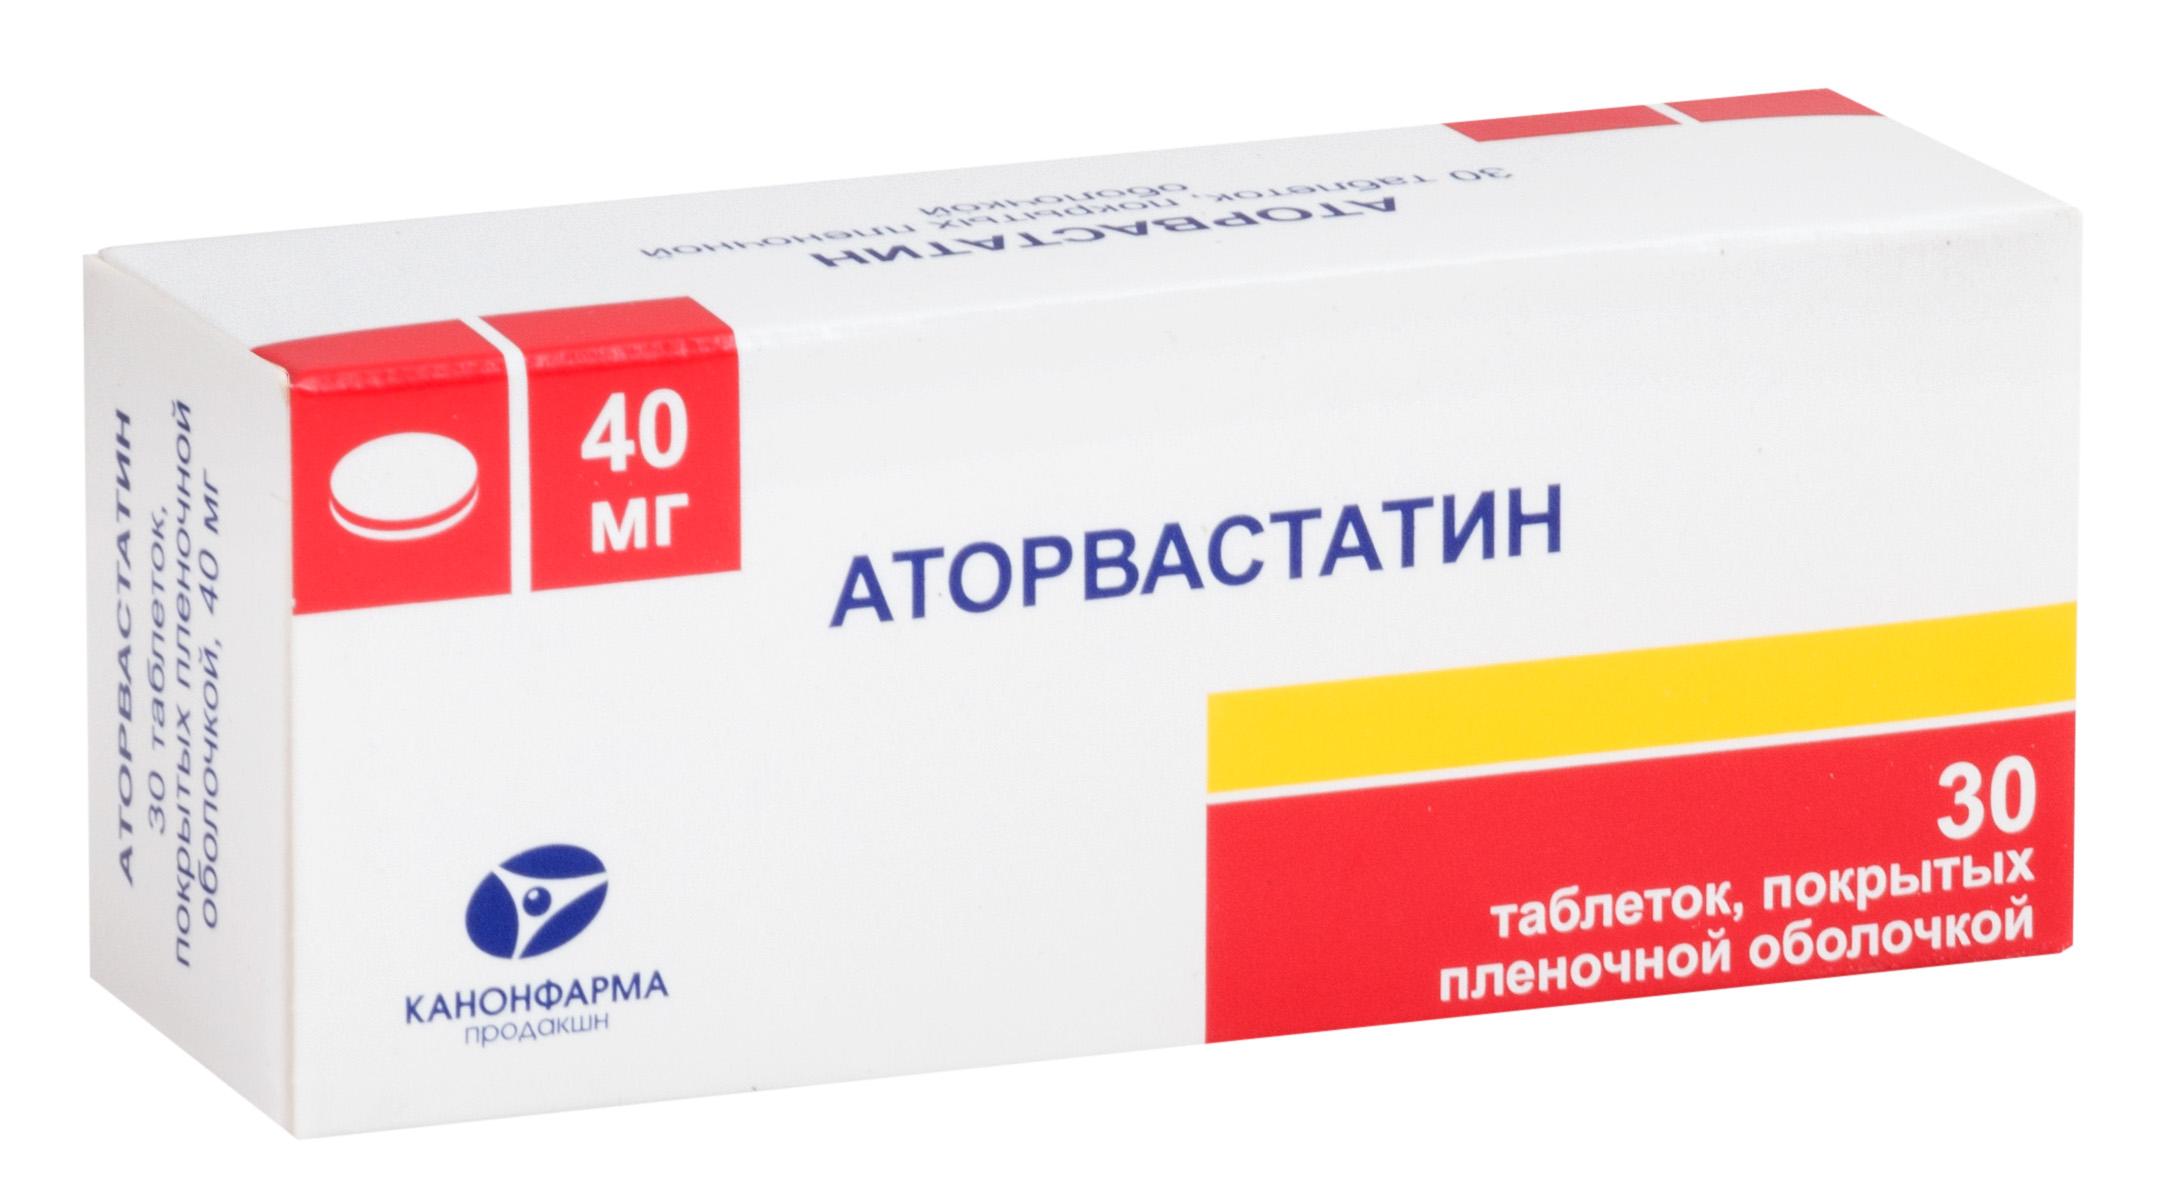 Аторвастатин таблетки п.п.о. 40мг №30 Канонфарма